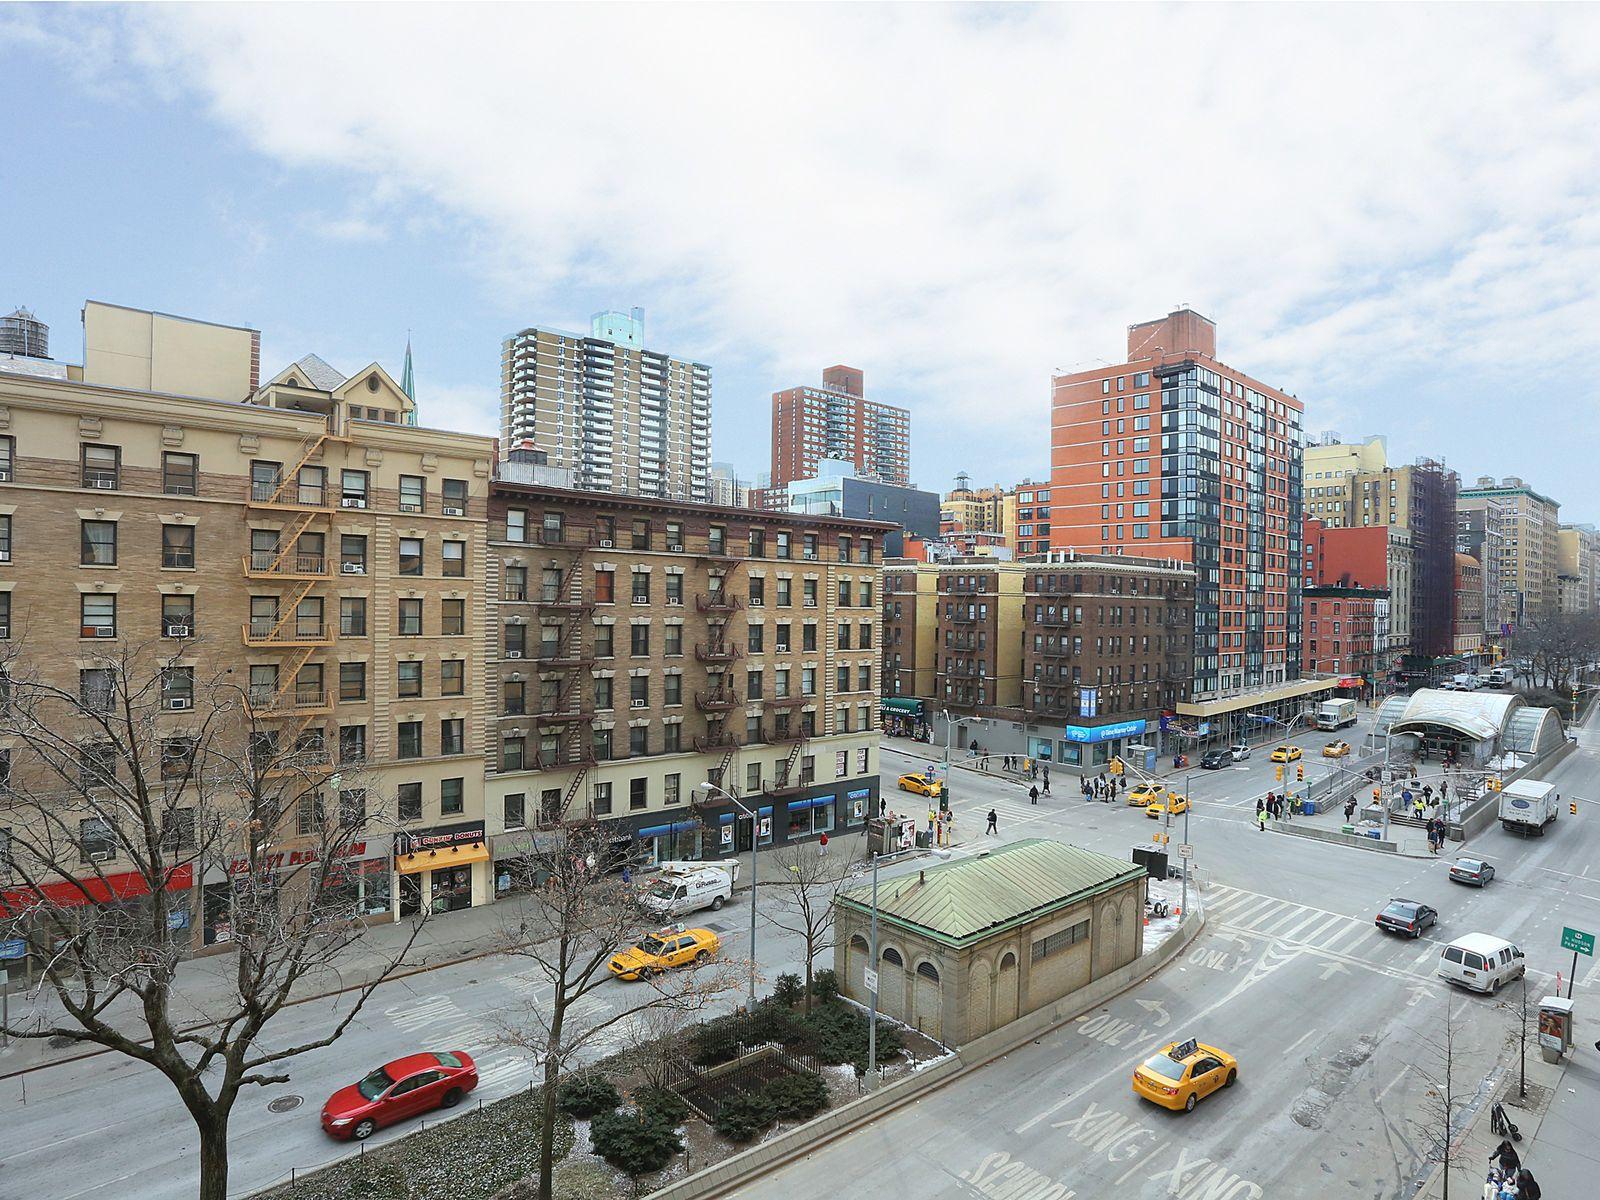 275 West 96th Street